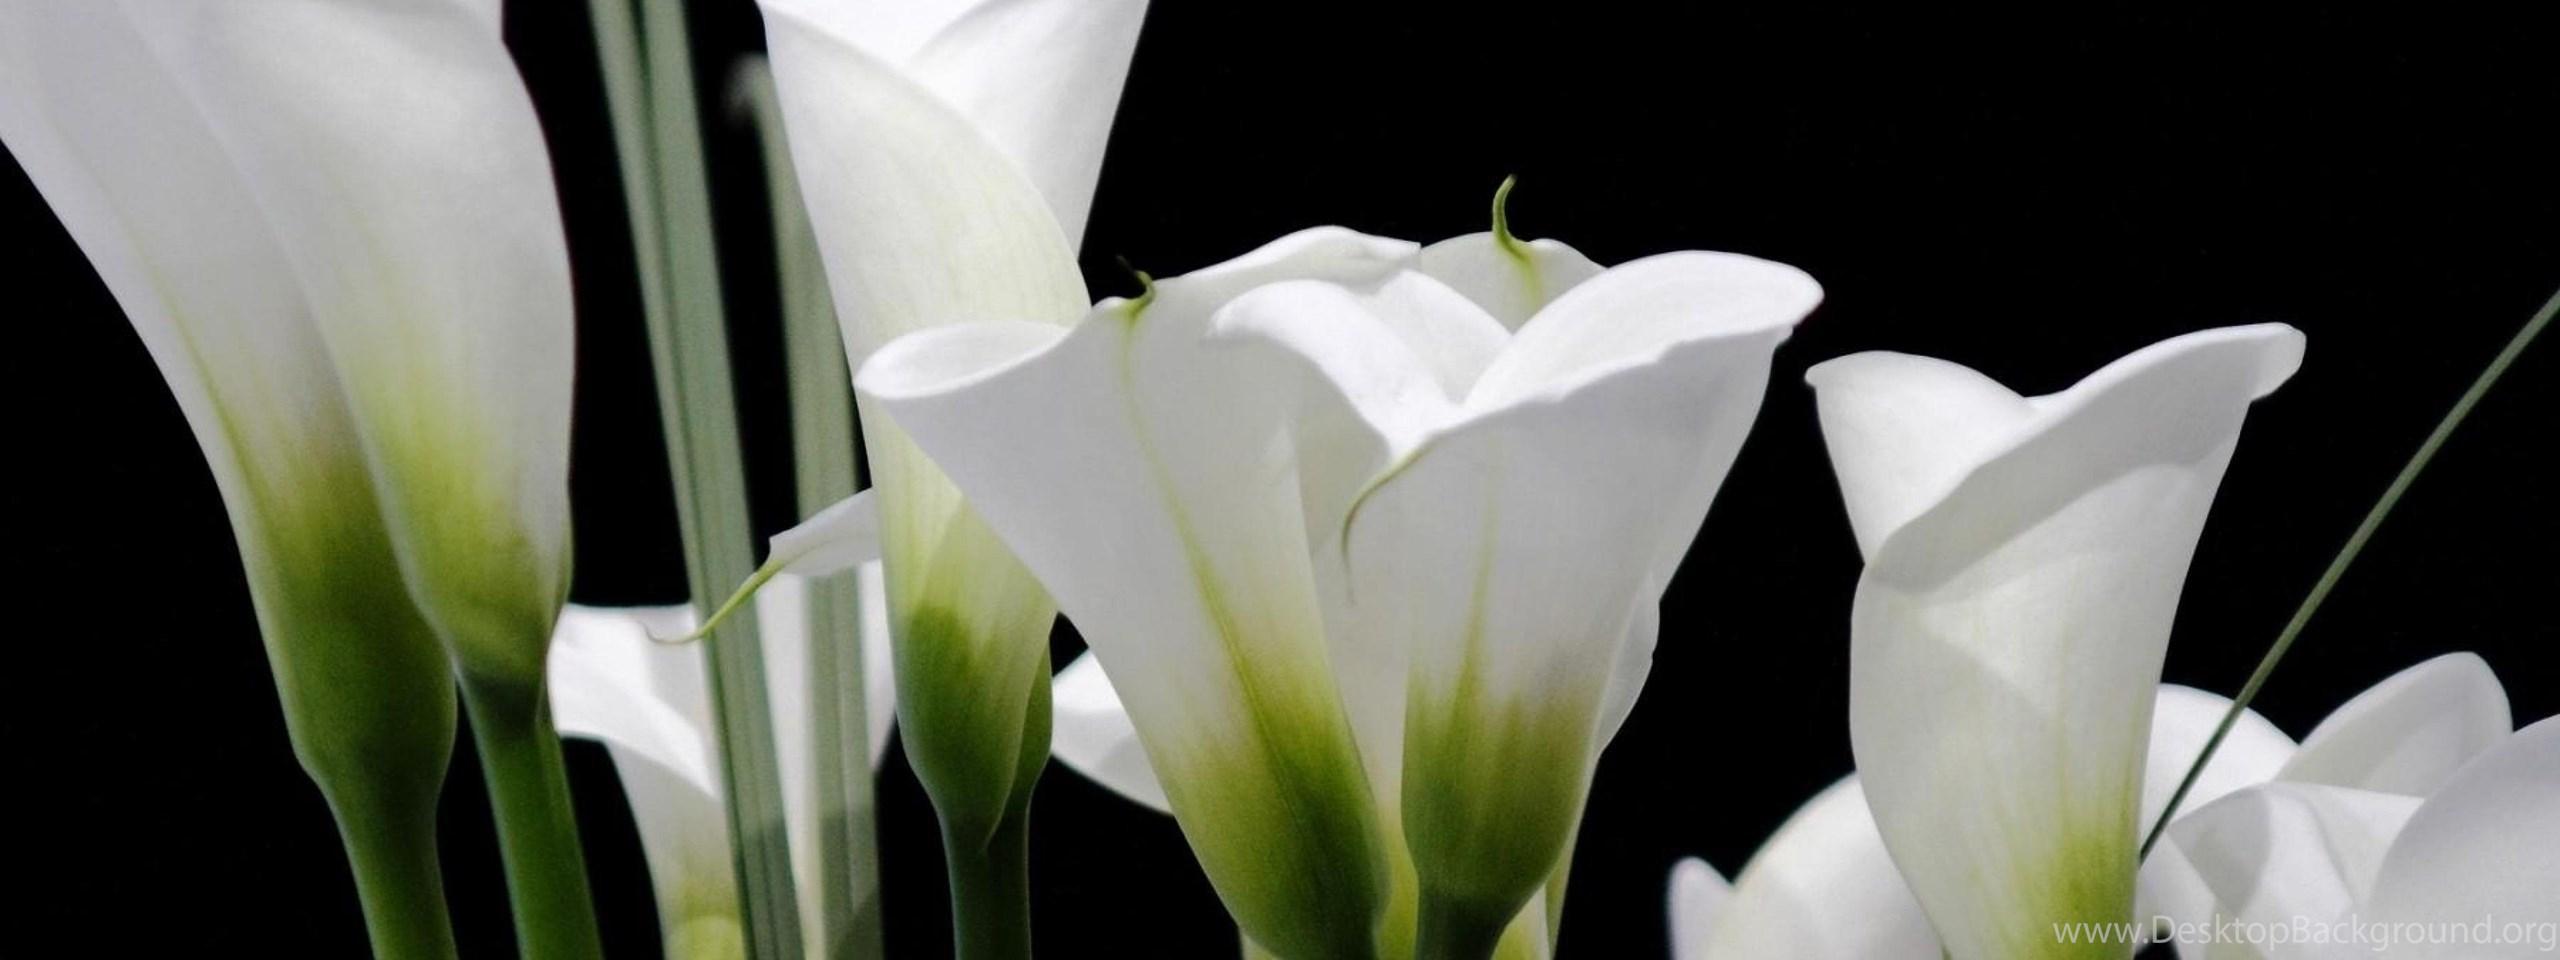 Delicate Calla Lilies HD Desktop Wallpaper for K Ultra HD TV